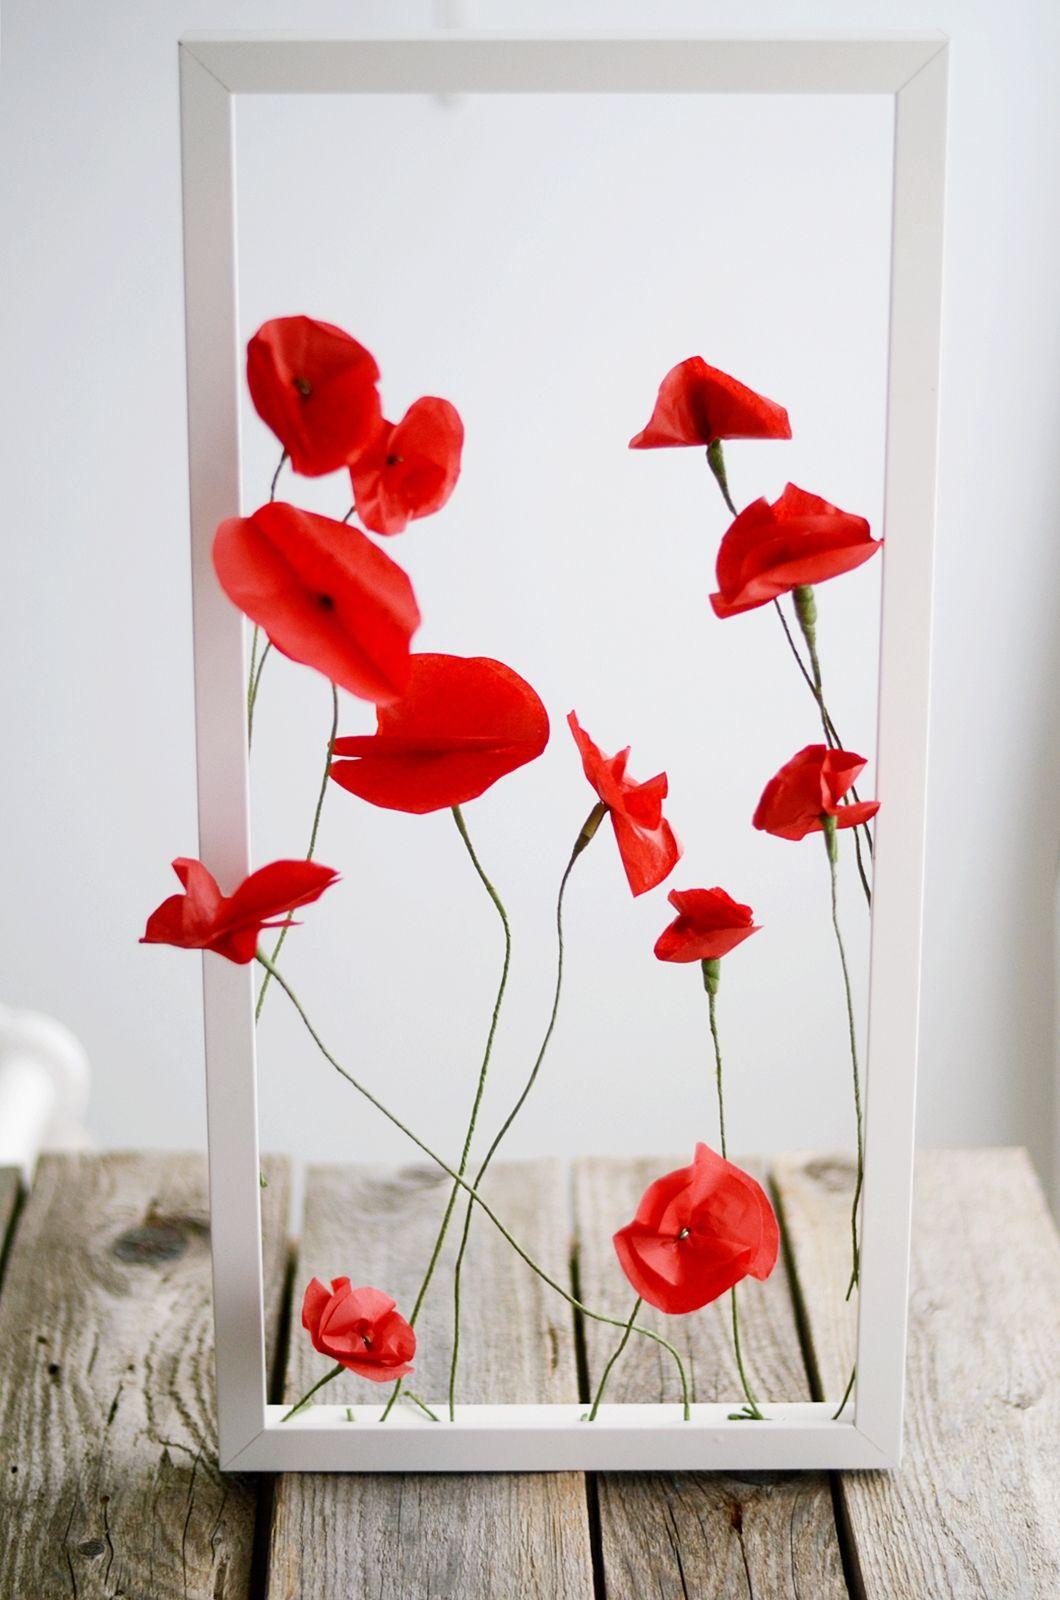 S I N N E N R A U S C H Nachmachtipp Klatschmohn Aus Seidenpapier Blumen Basteln Aus Papier Blumen Basteln Seidenpapier